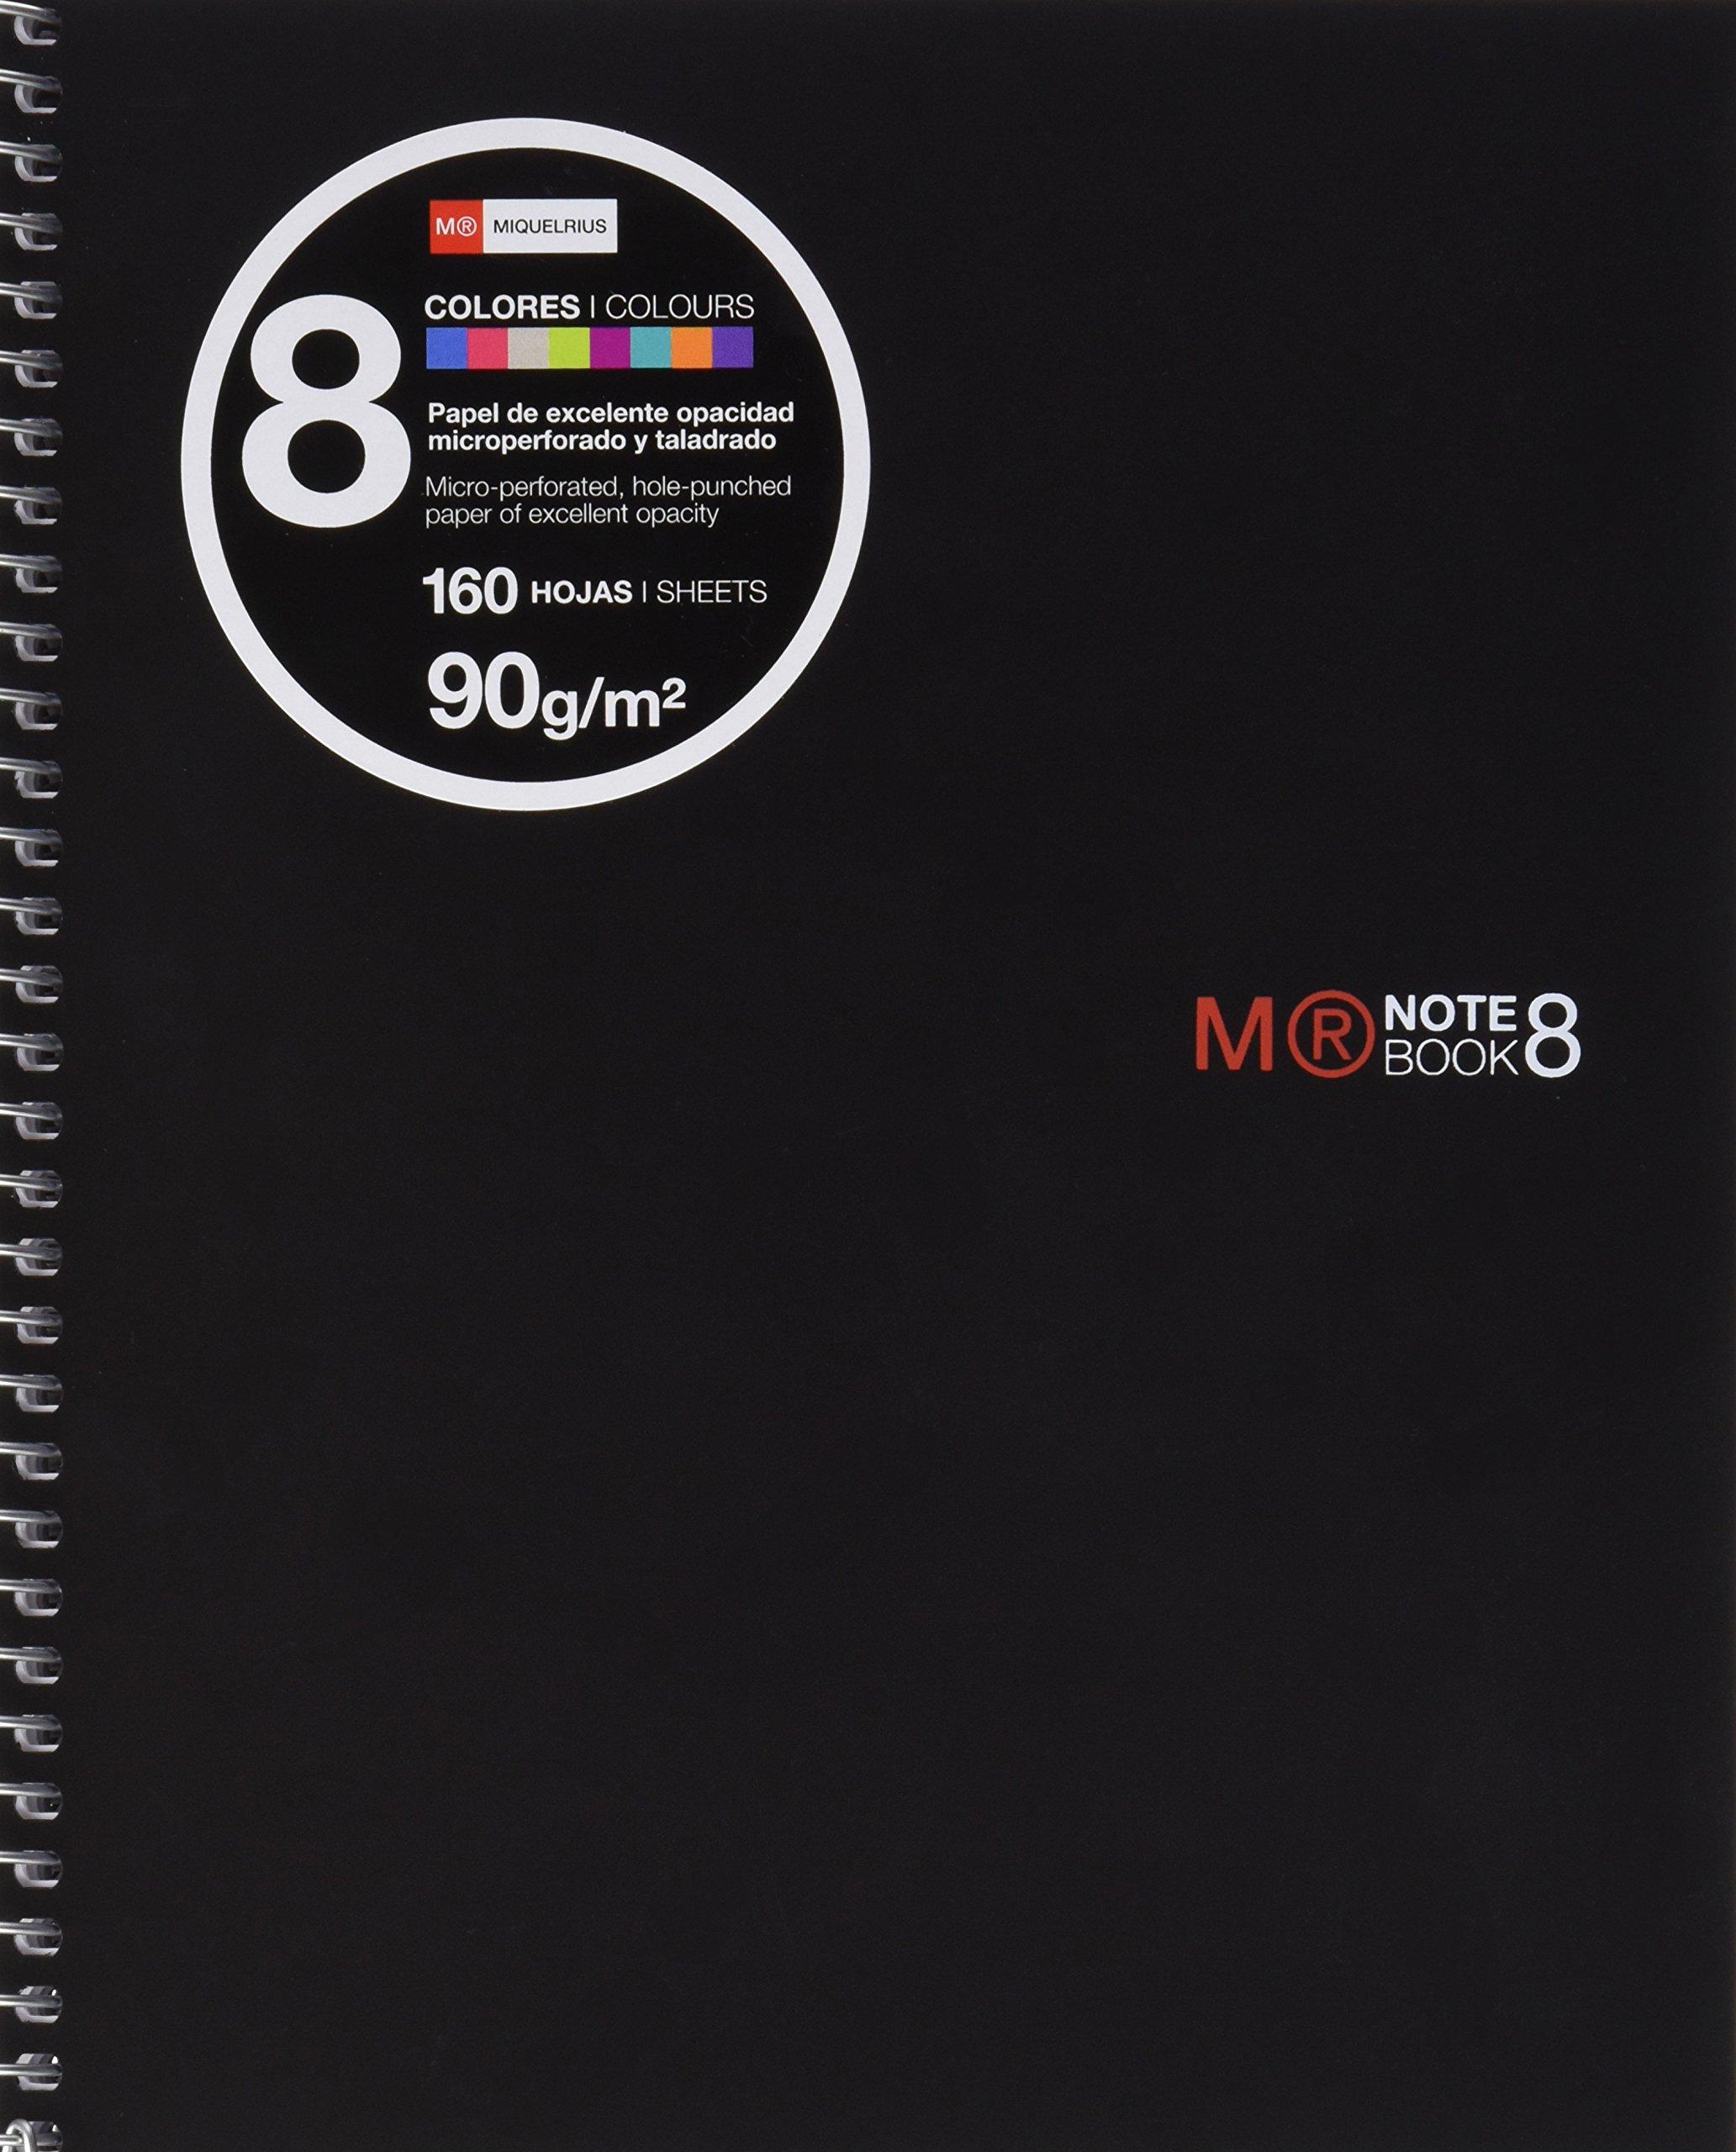 Miquel Rius 44905 - Black Notepad A5 Size 160 Sheets